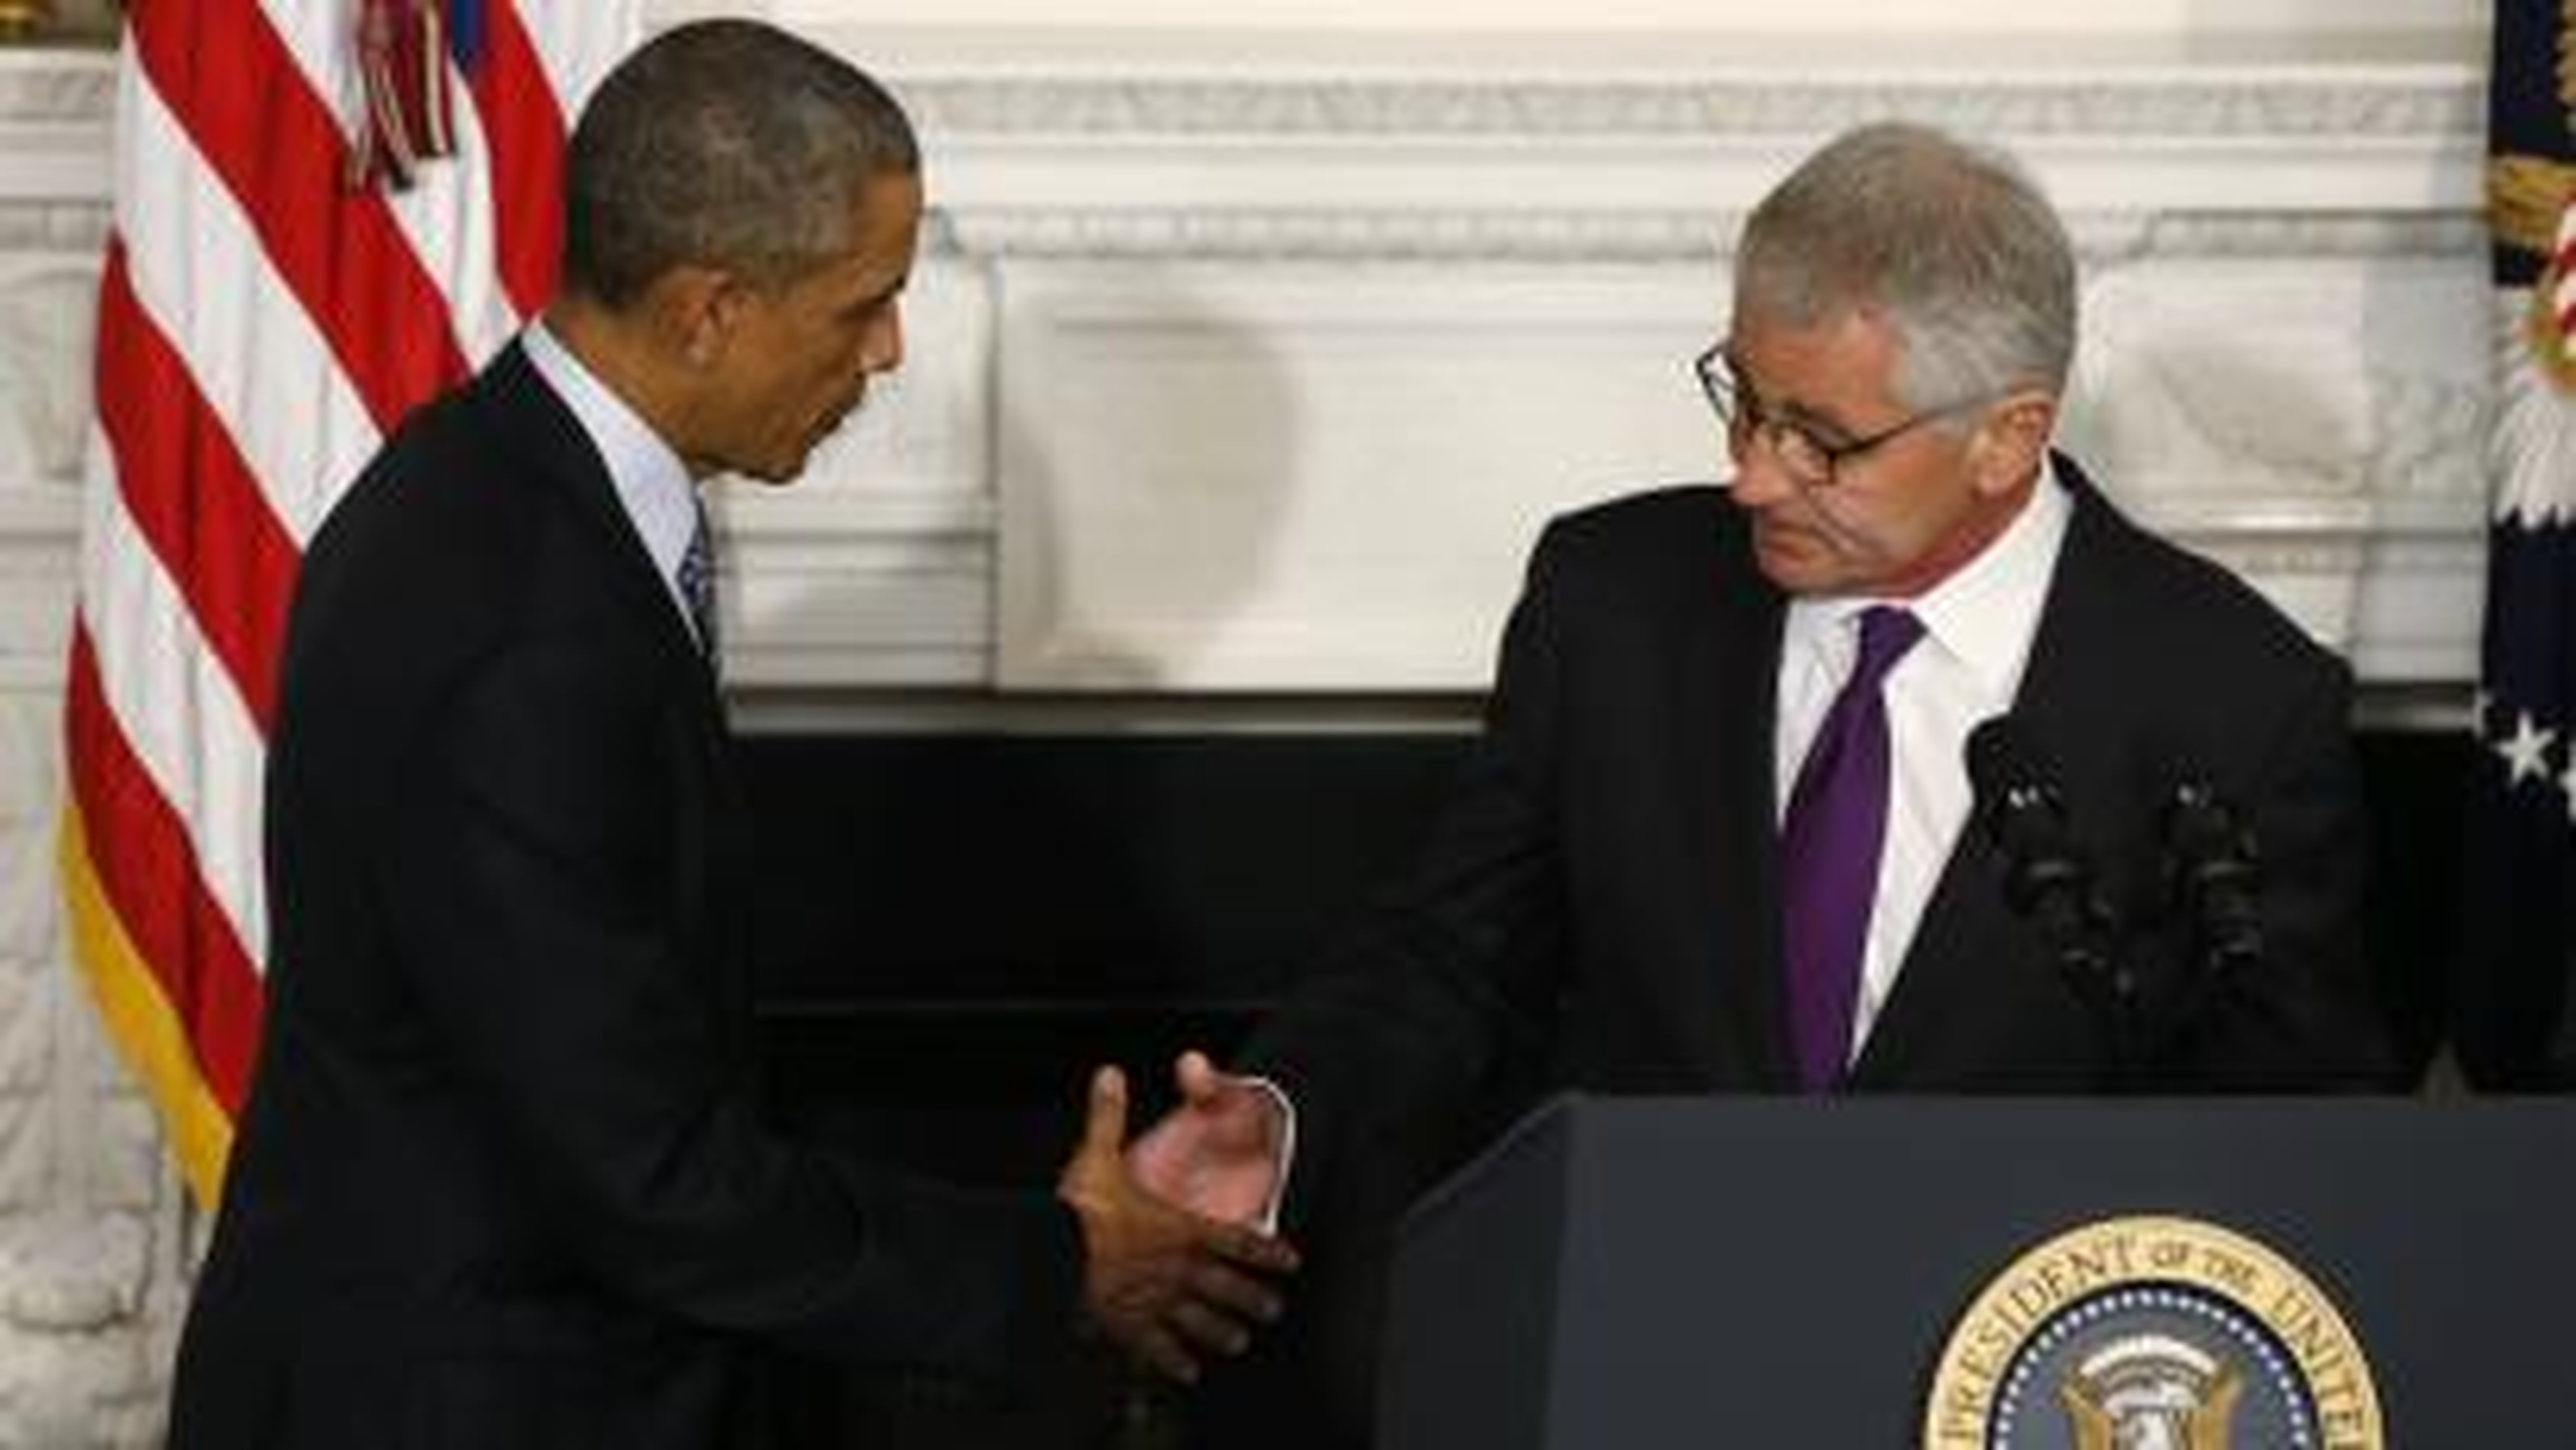 President Barack Obama says goodbye to his defense secretary Chuck Hagel, who resigned on Nov. 24, 2014.